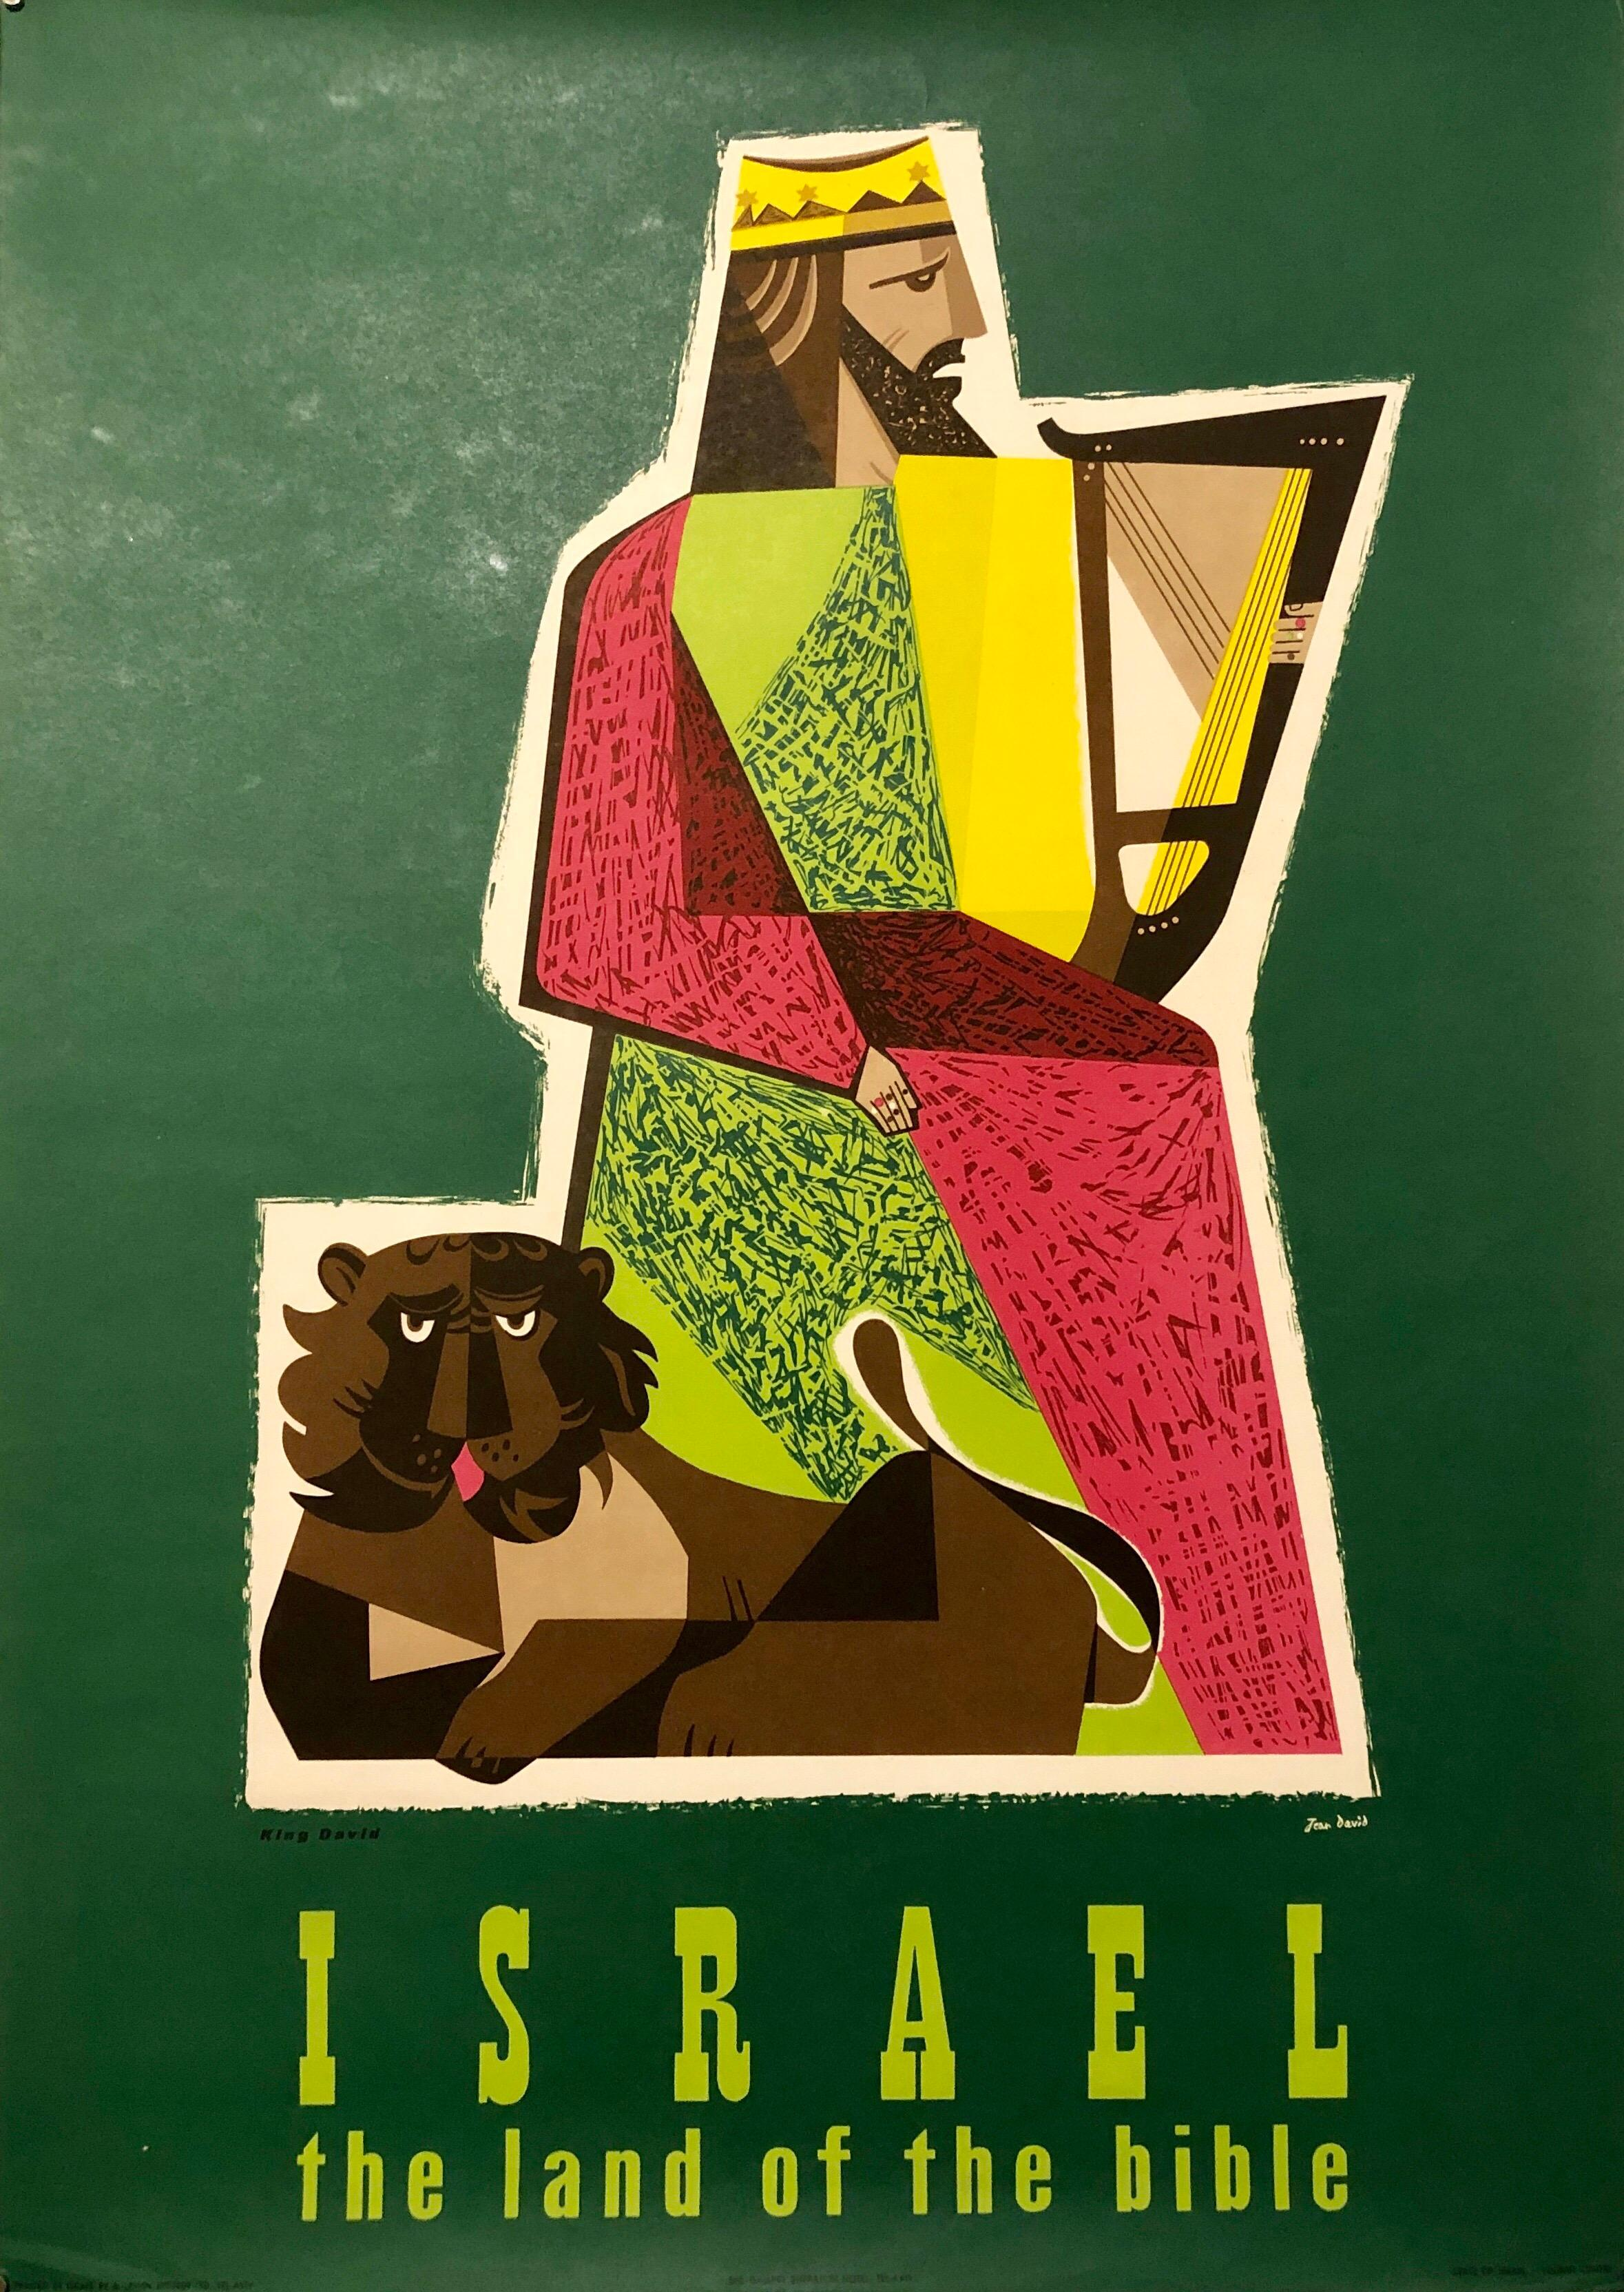 1950s Vintage Travel Poster Israeli Tourist Center Modernist KIng David and Lion